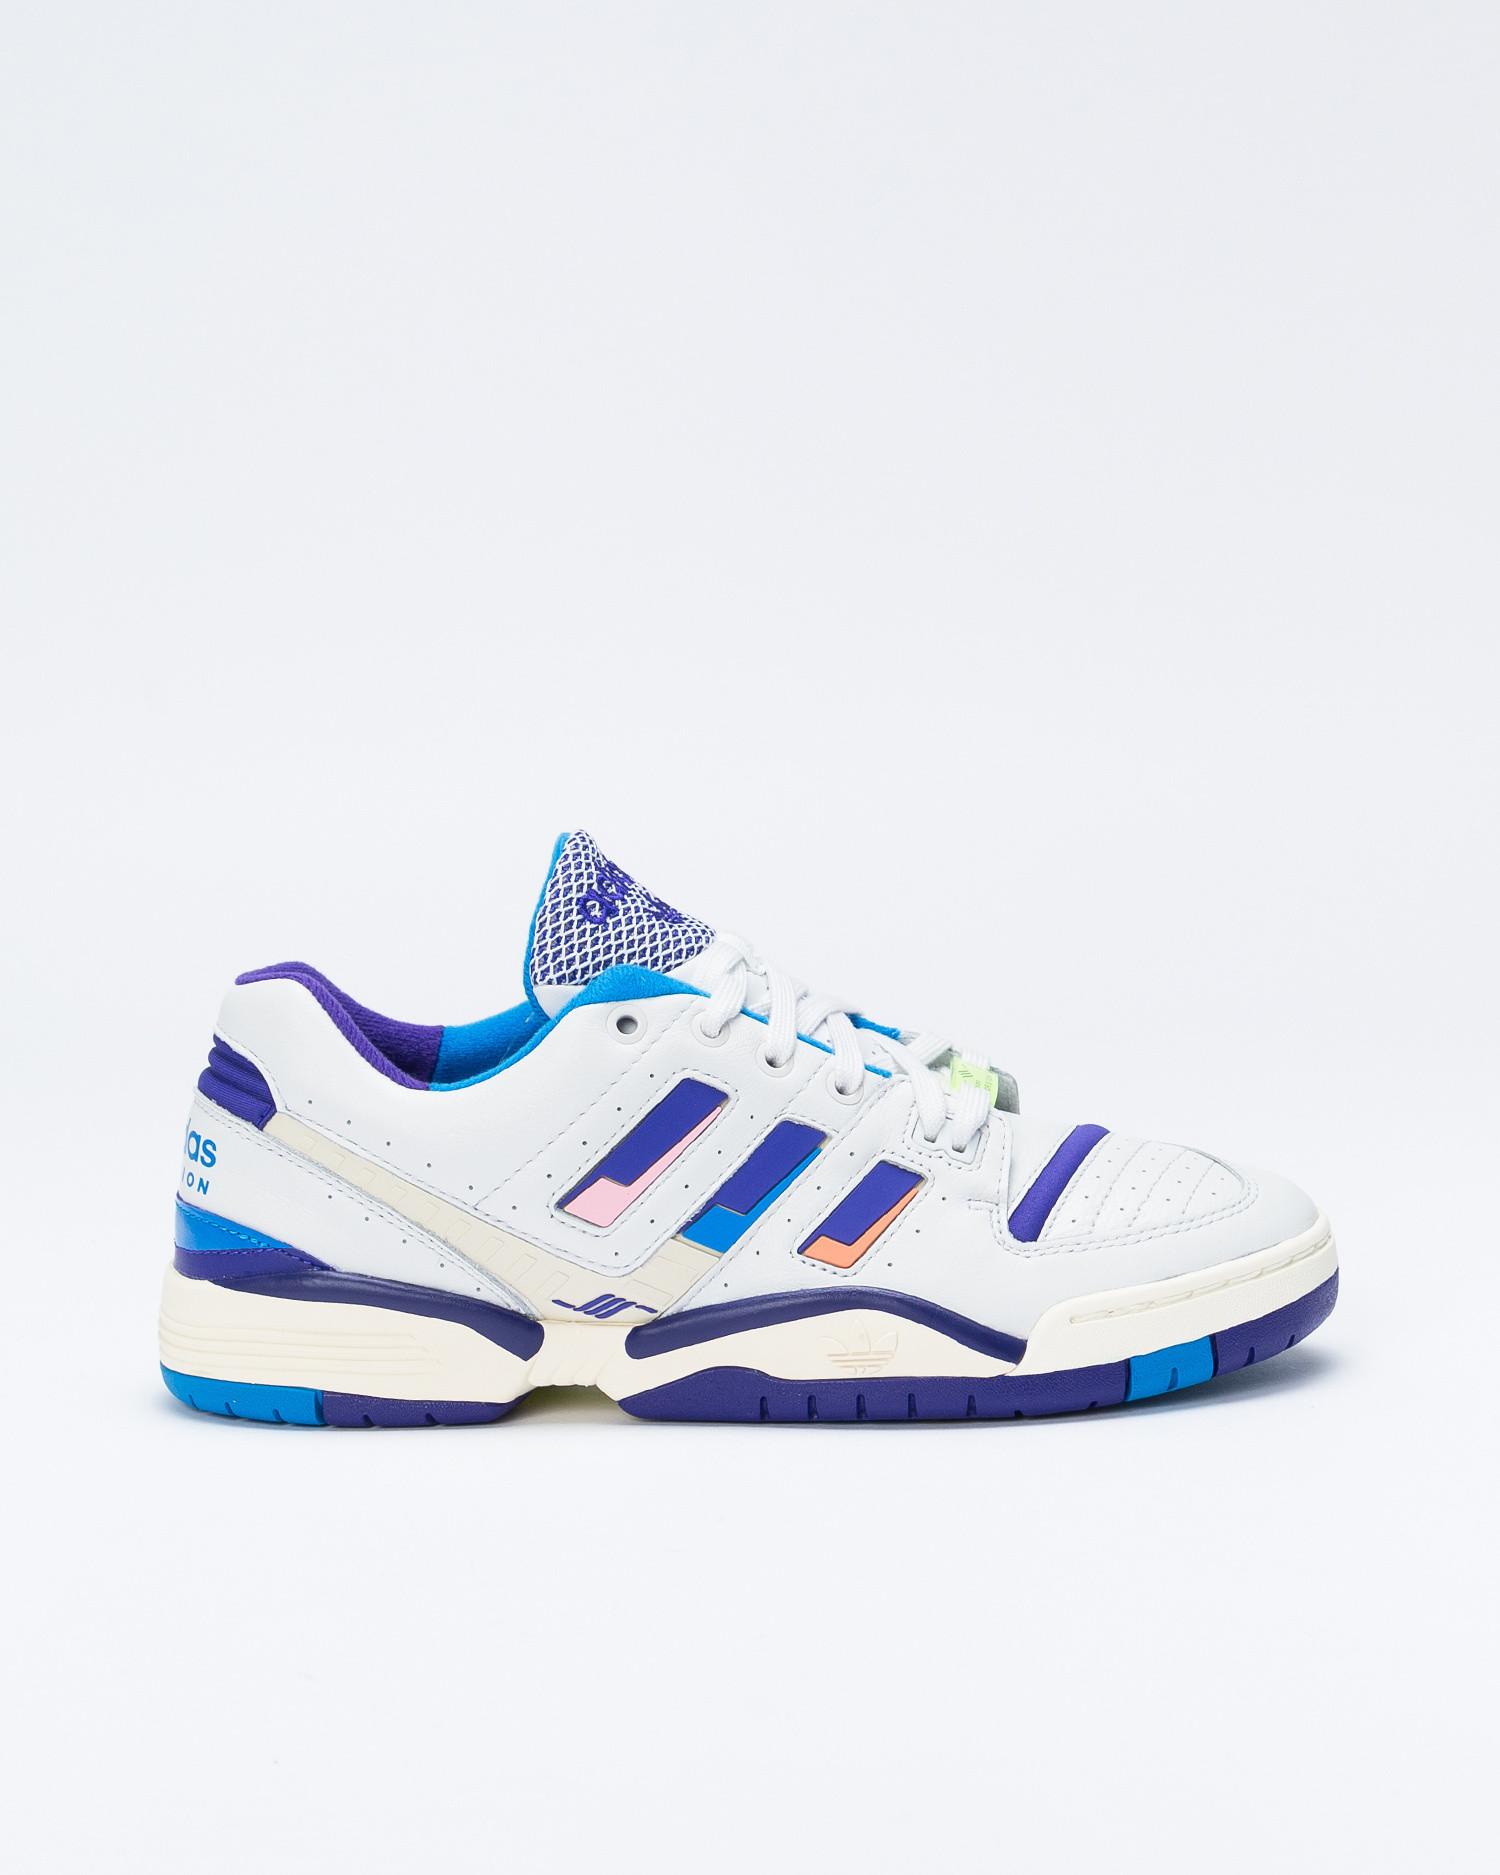 Adidas Consortium Torsion Edberg Comp OWhite/CBlack/Syello